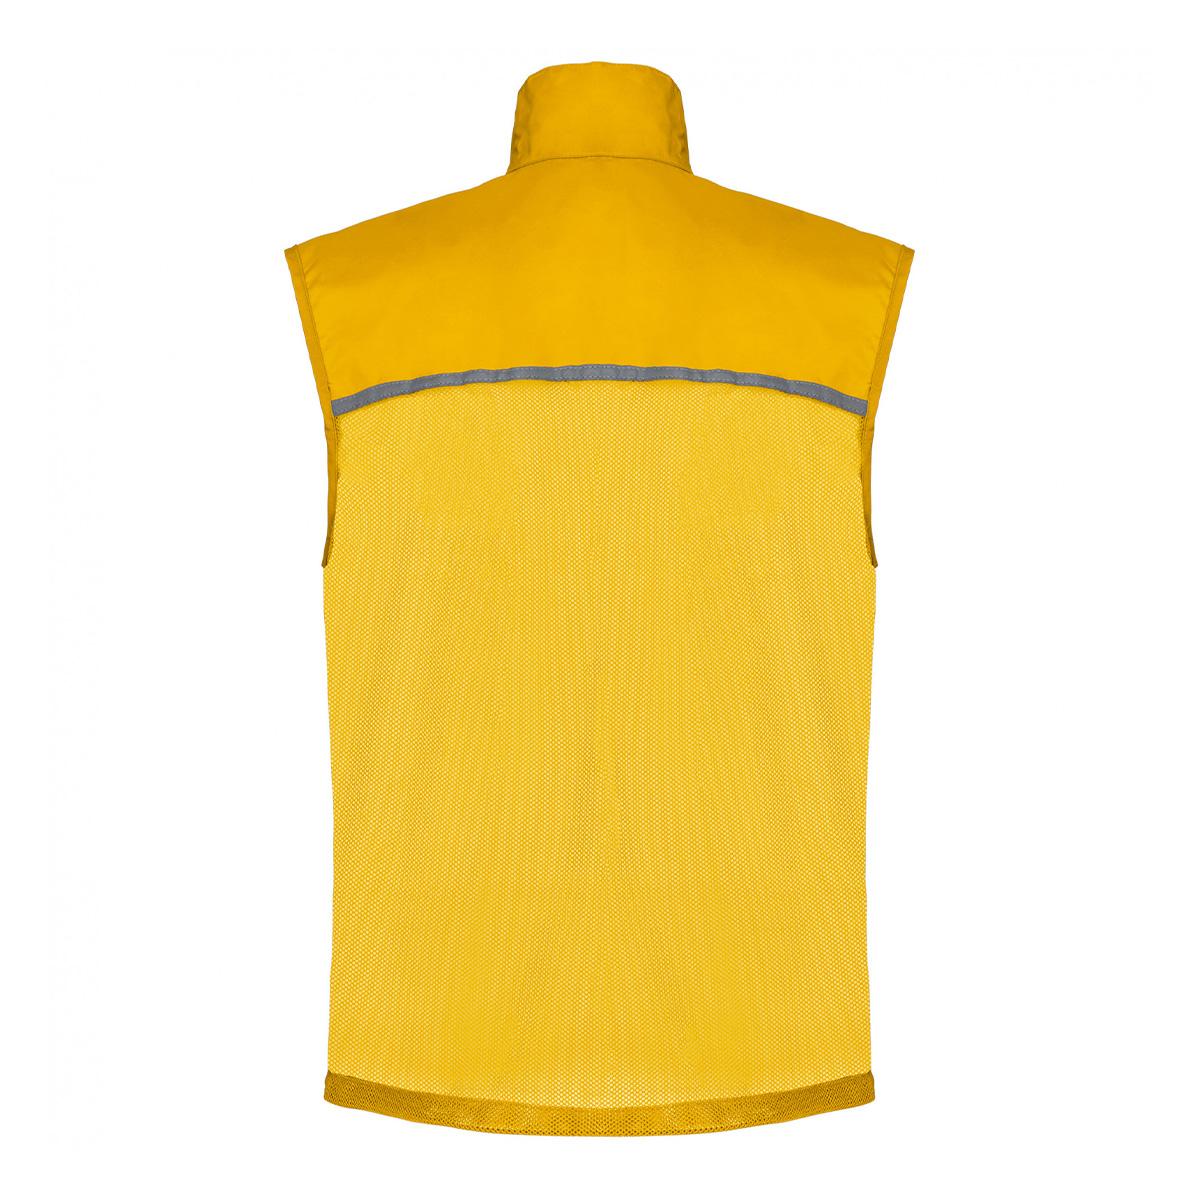 D05_pa234_yellow--0-0--9c5dc738-a1df-4b33-878c-7298866a7ced